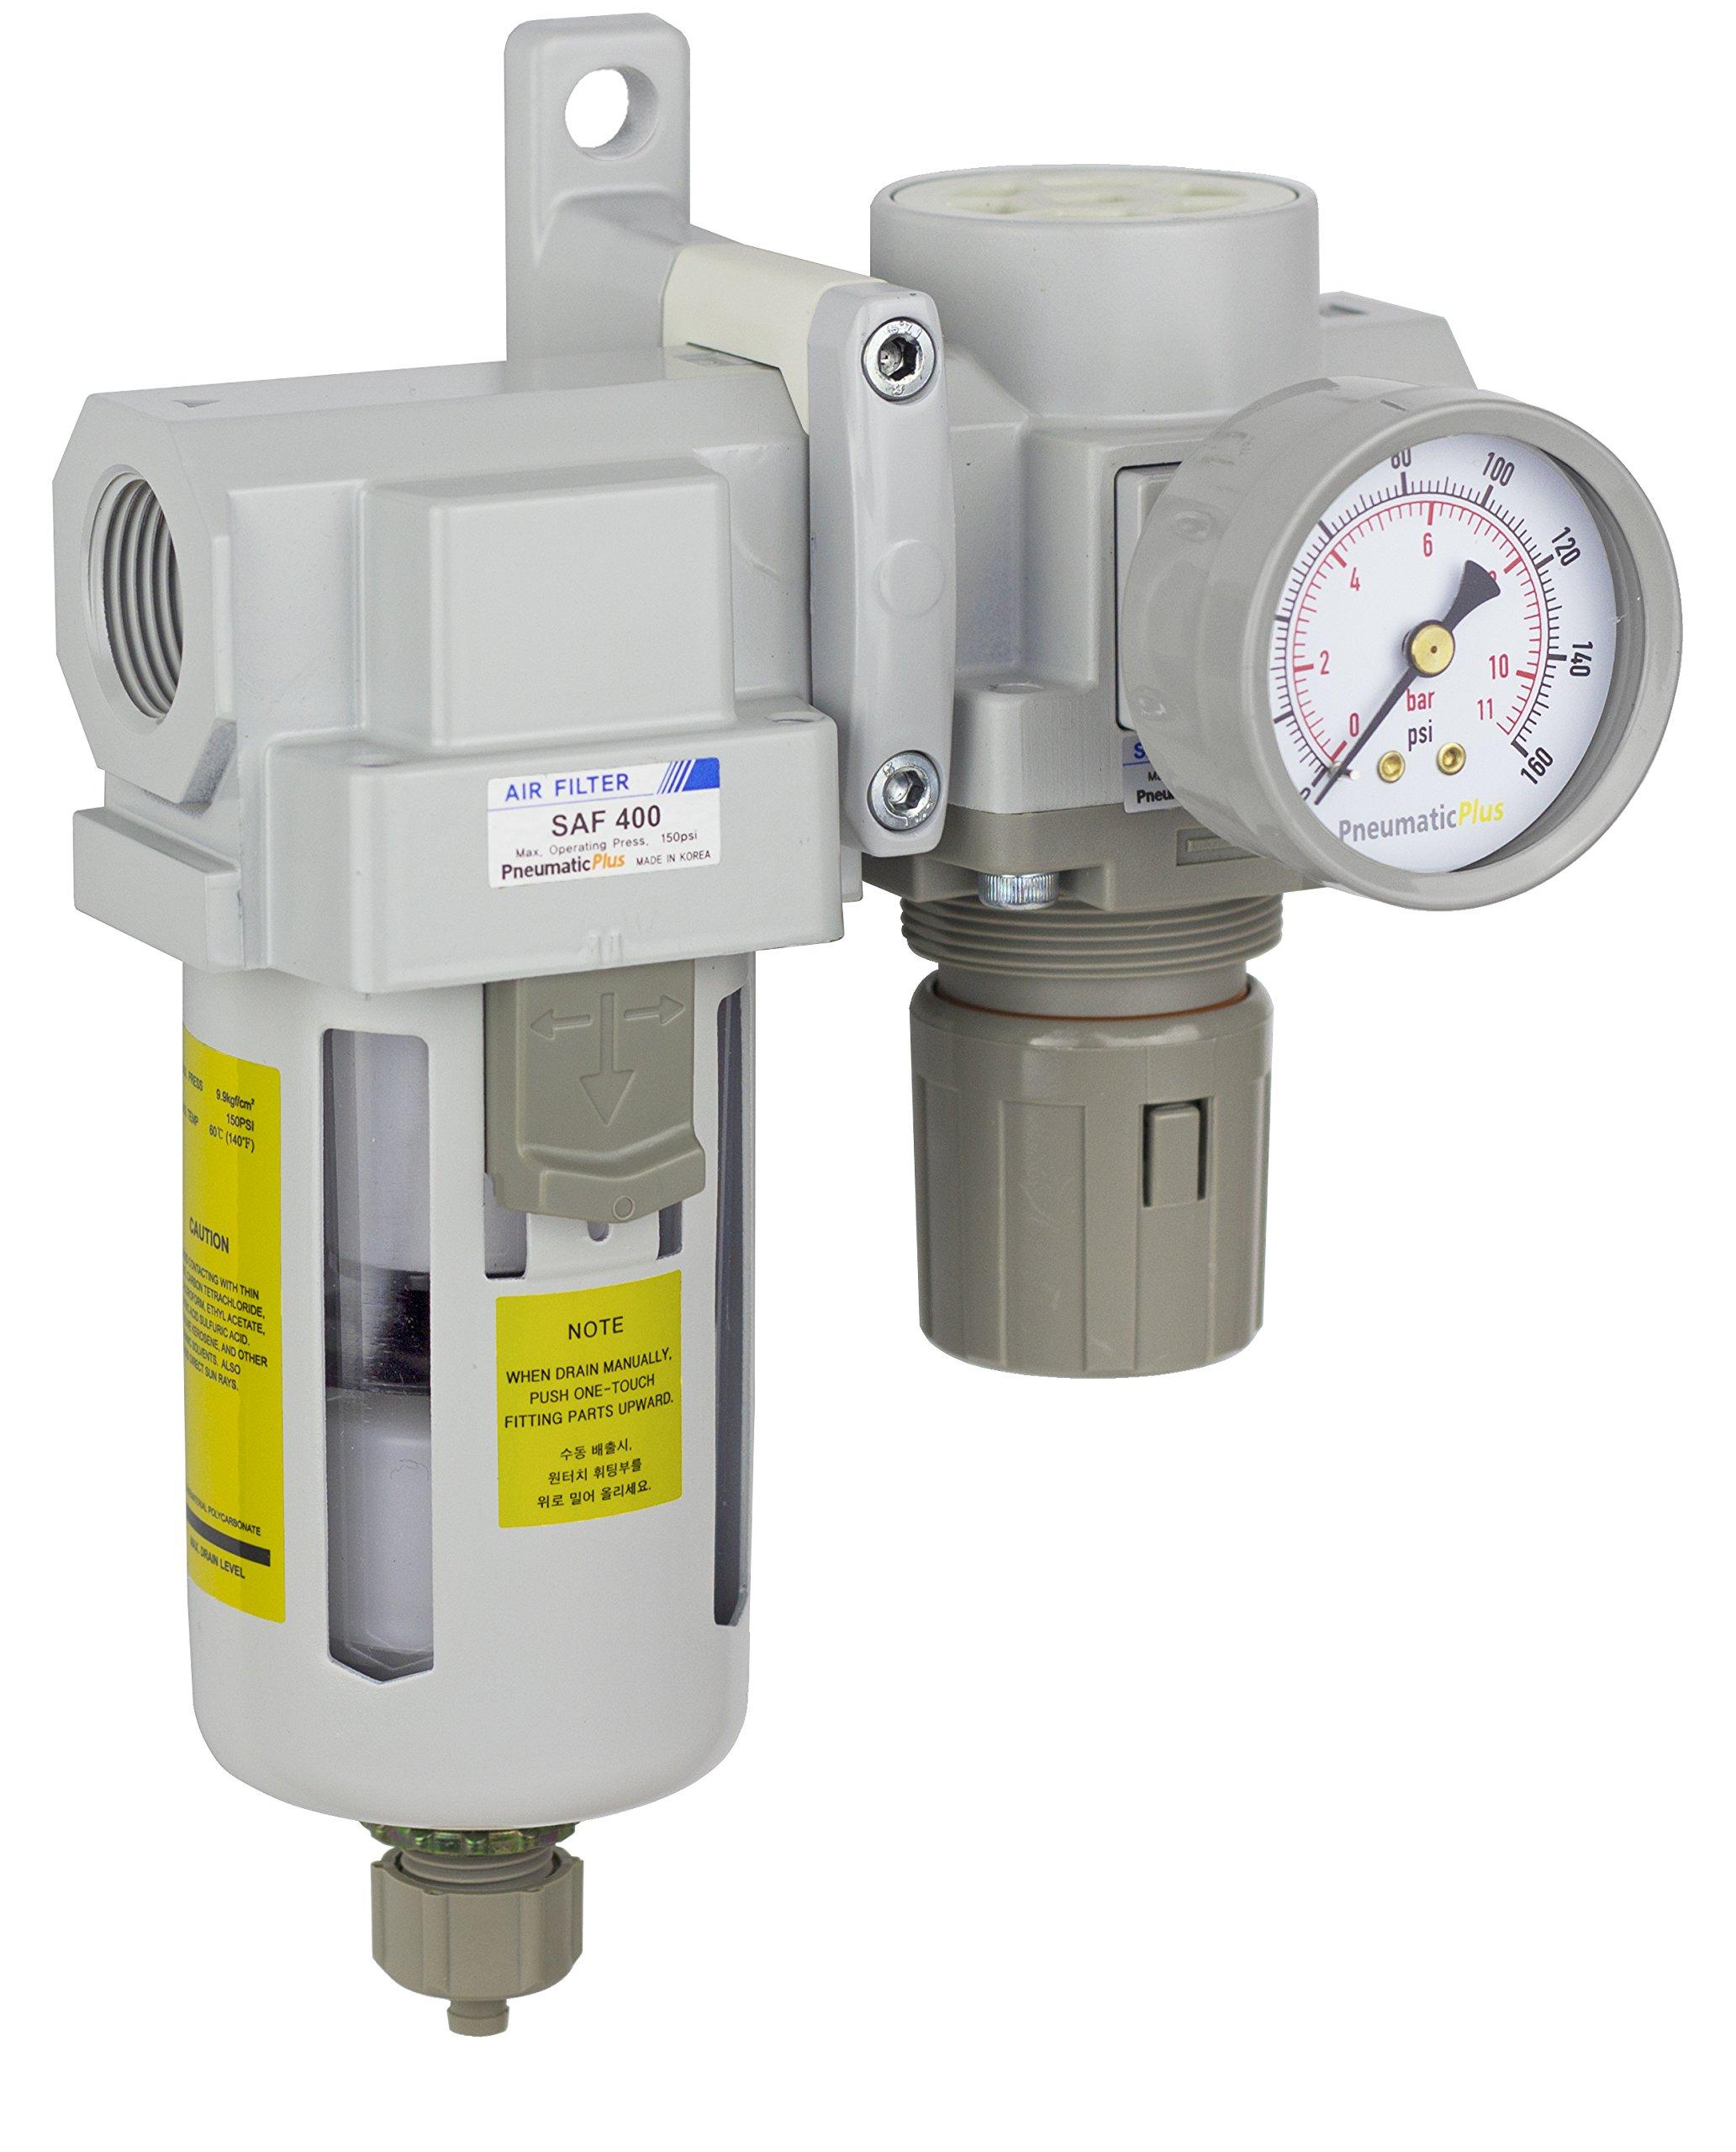 PneumaticPlus SAU420-N06G Compressed Air Filter Regulator Combo 3/4'' NPT - Poly Bowl, Manual Drain, Bracket, Gauge by PneumaticPlus